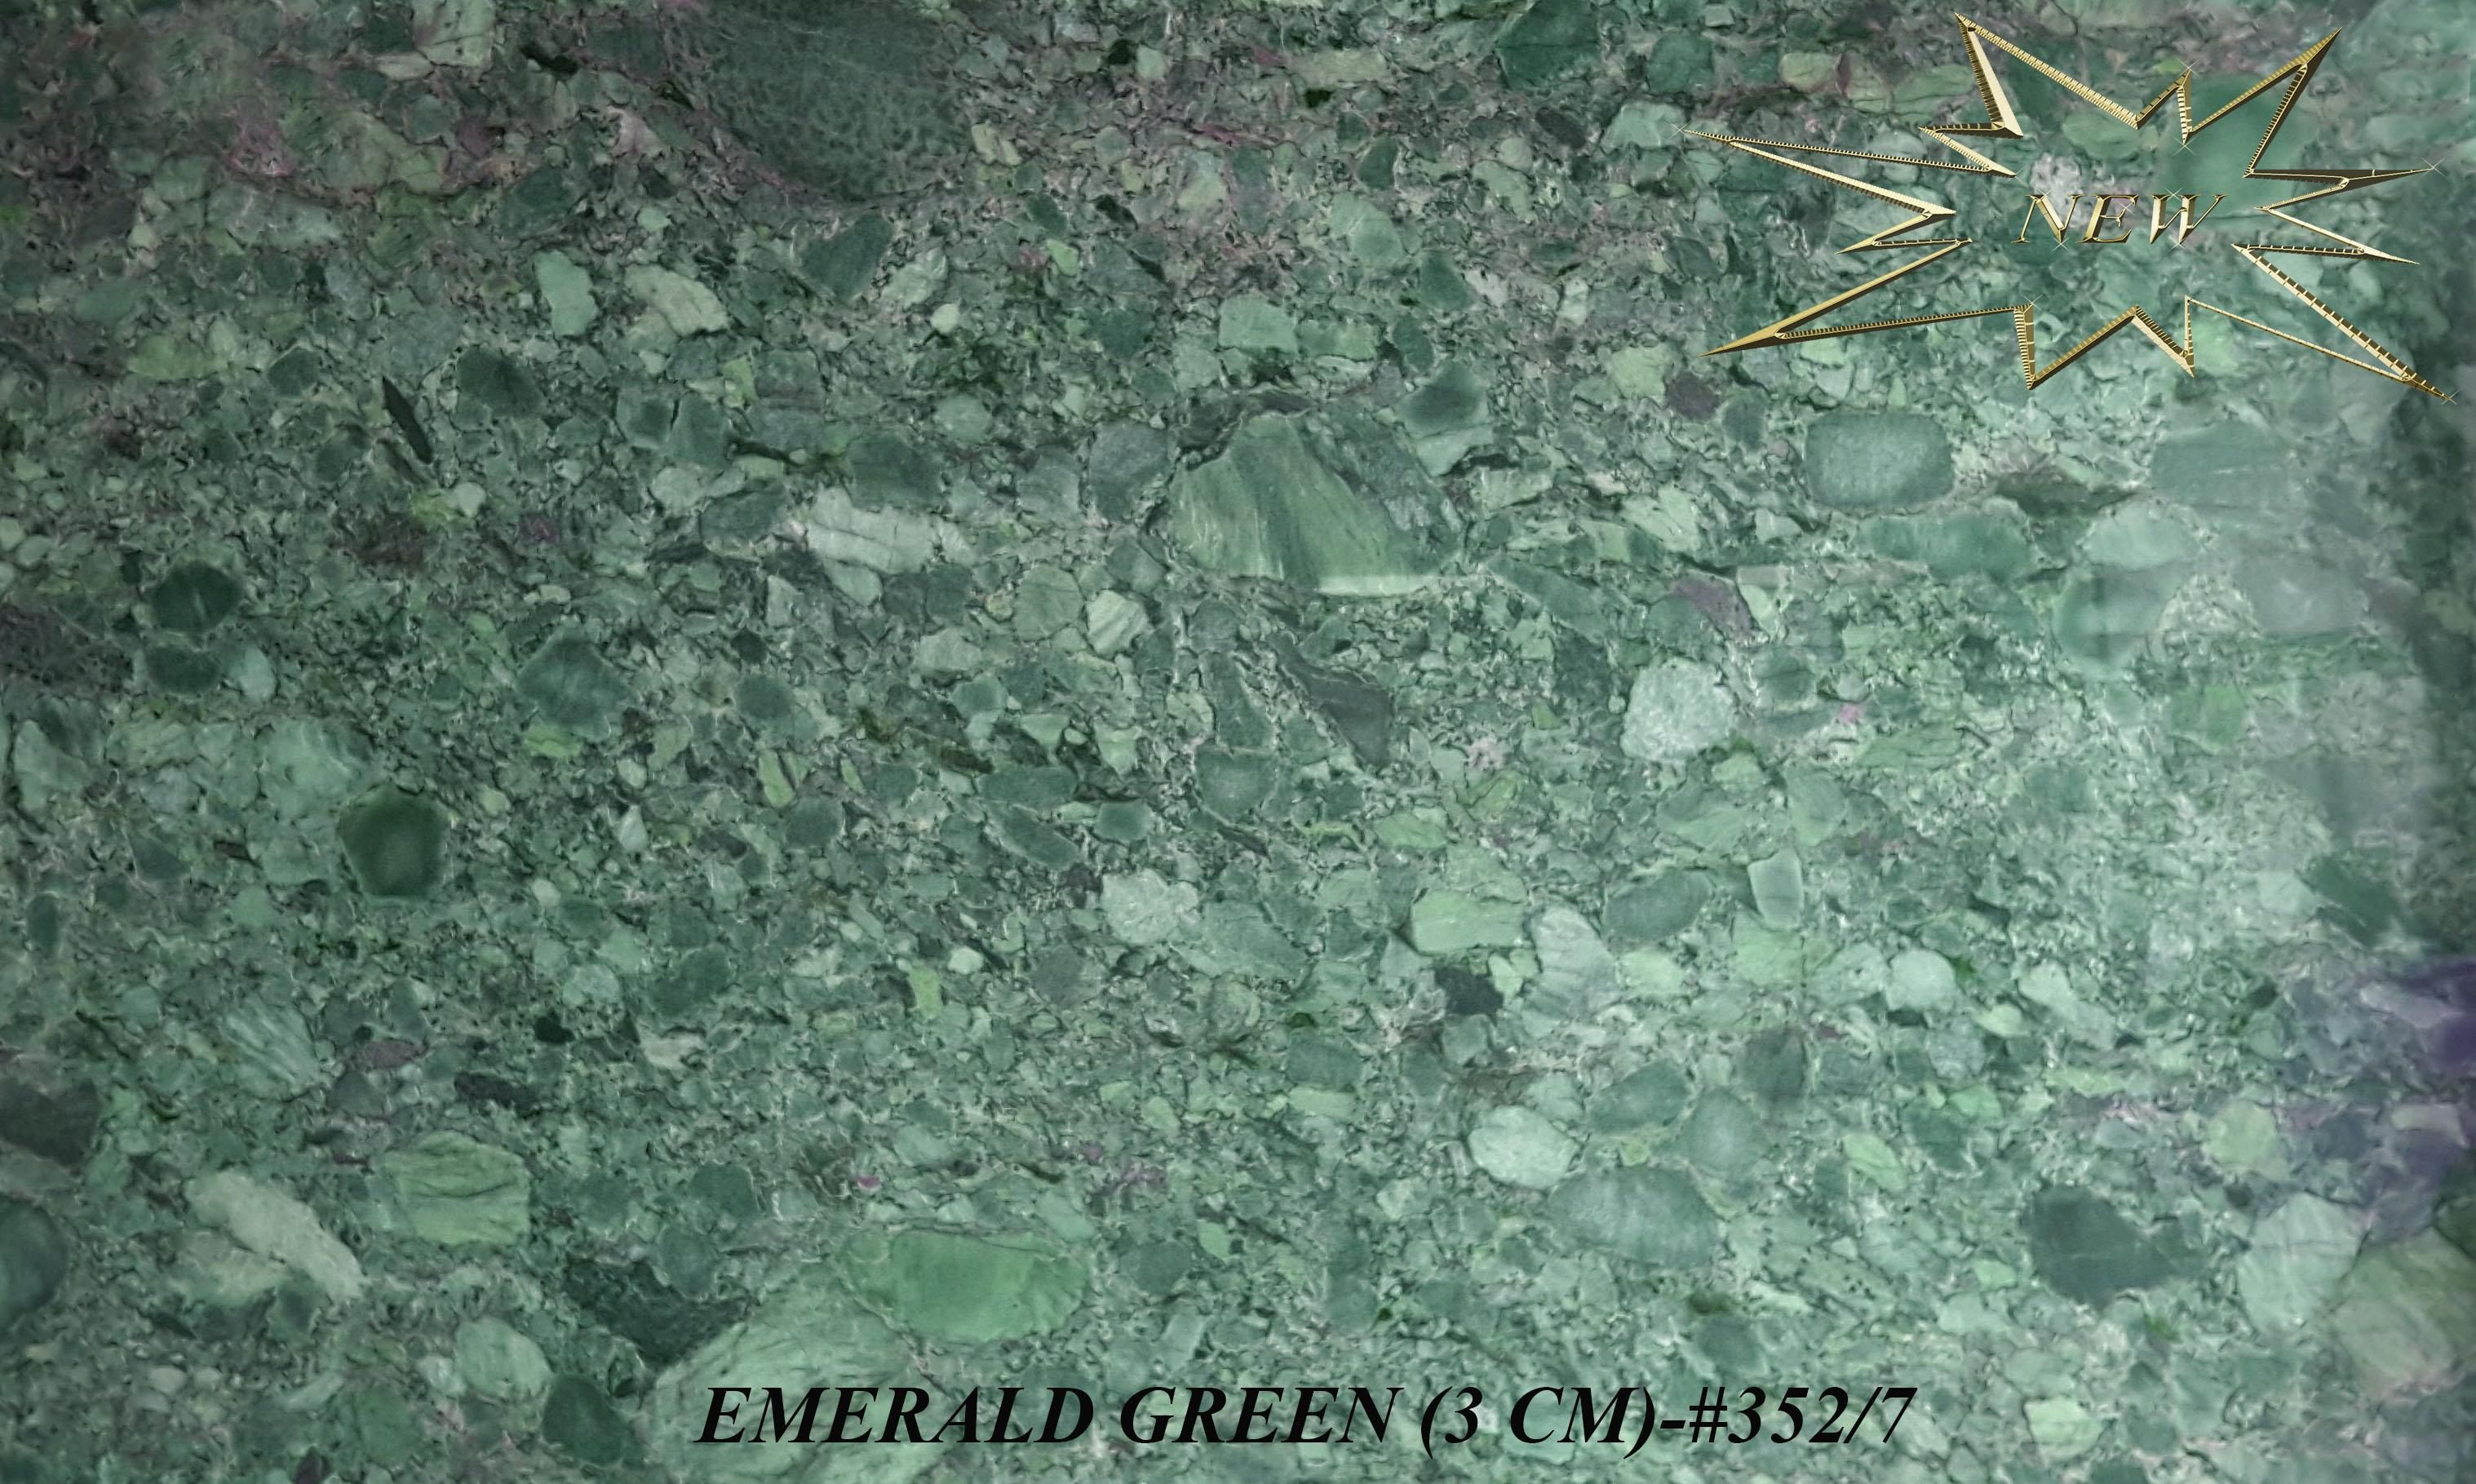 EMERALD GREEN 3CM-#352-7